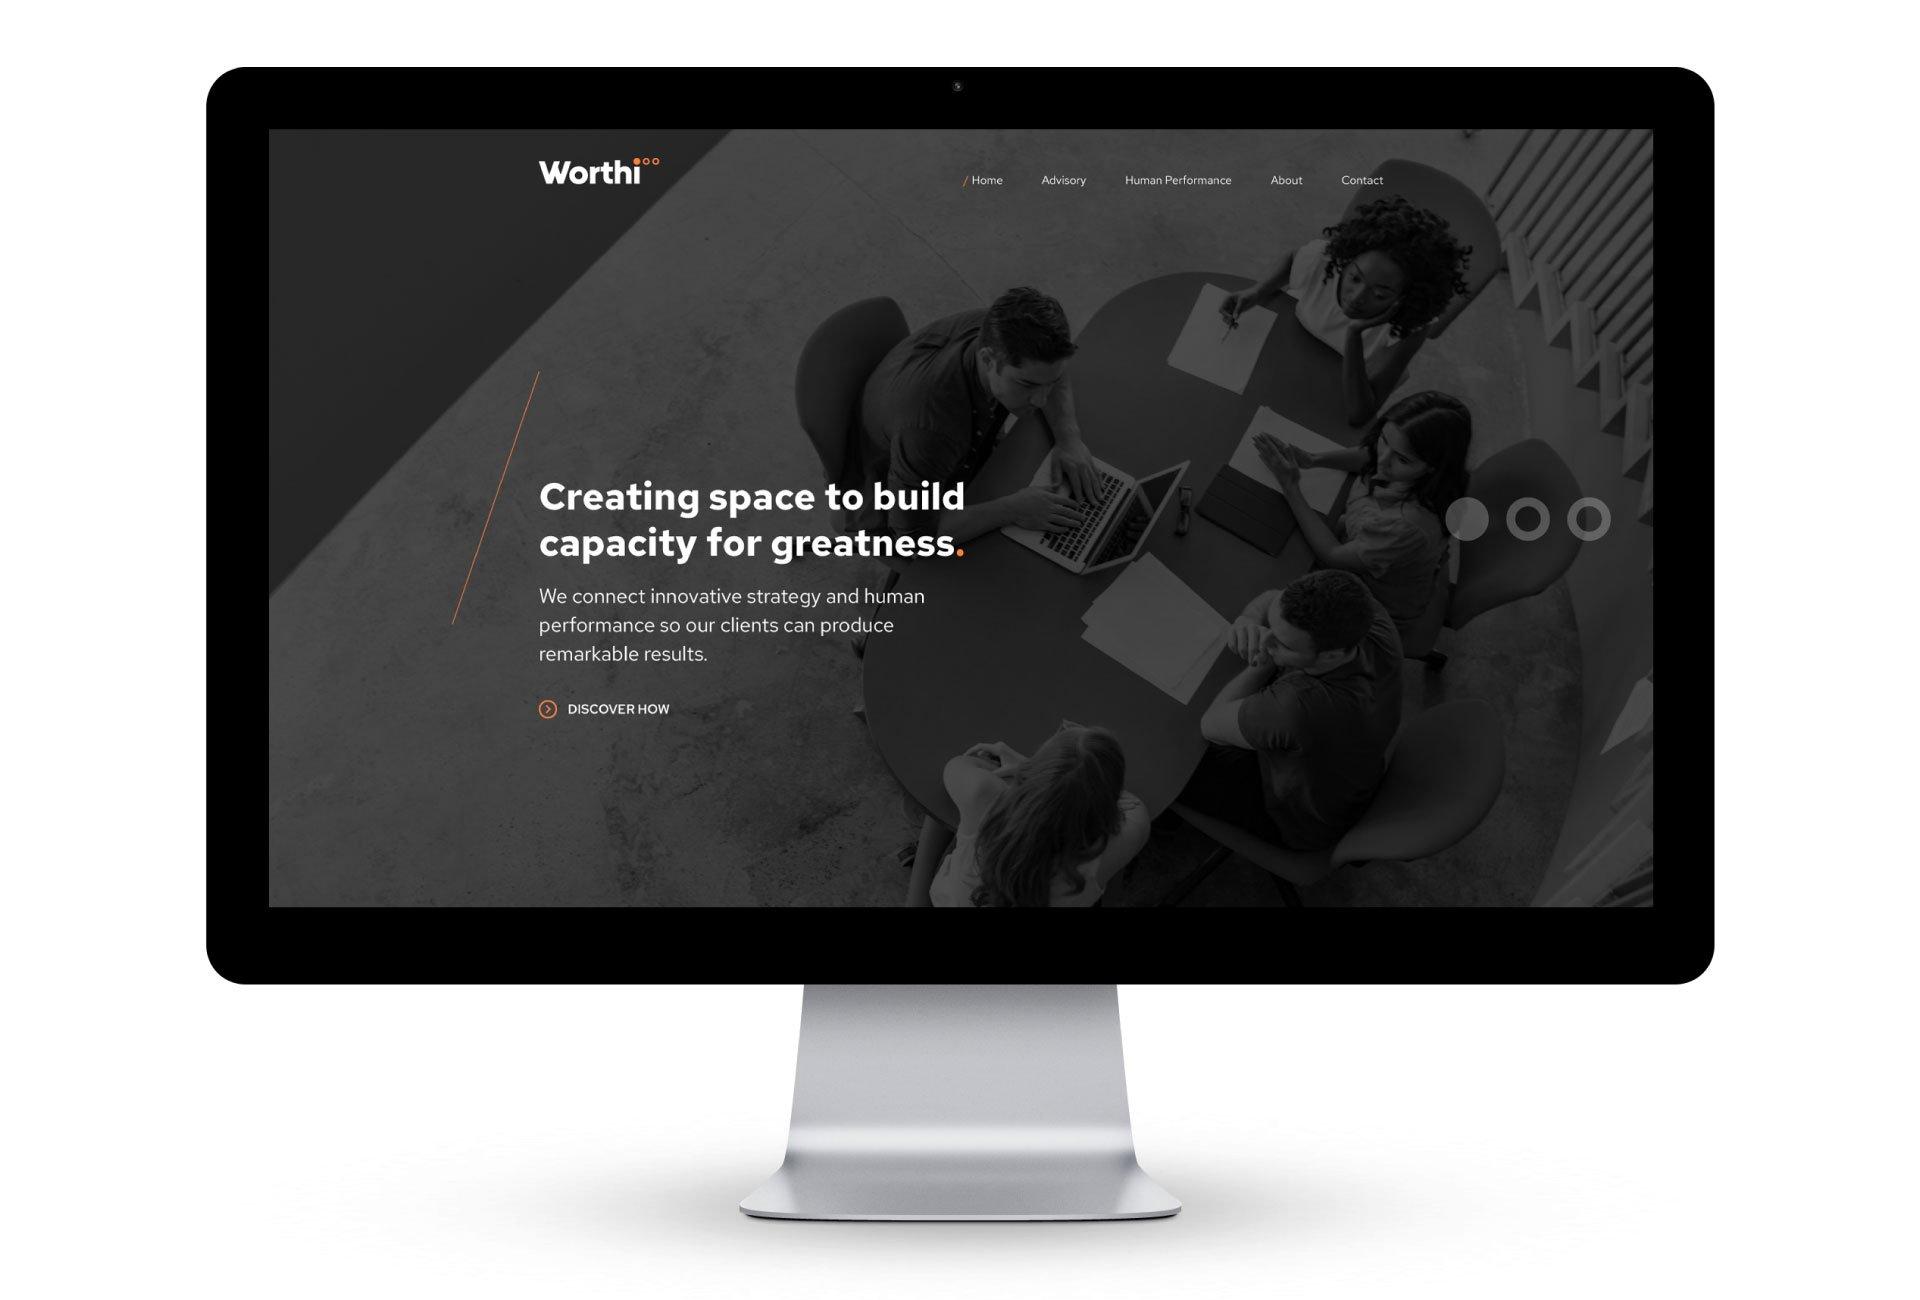 worthi web design perth